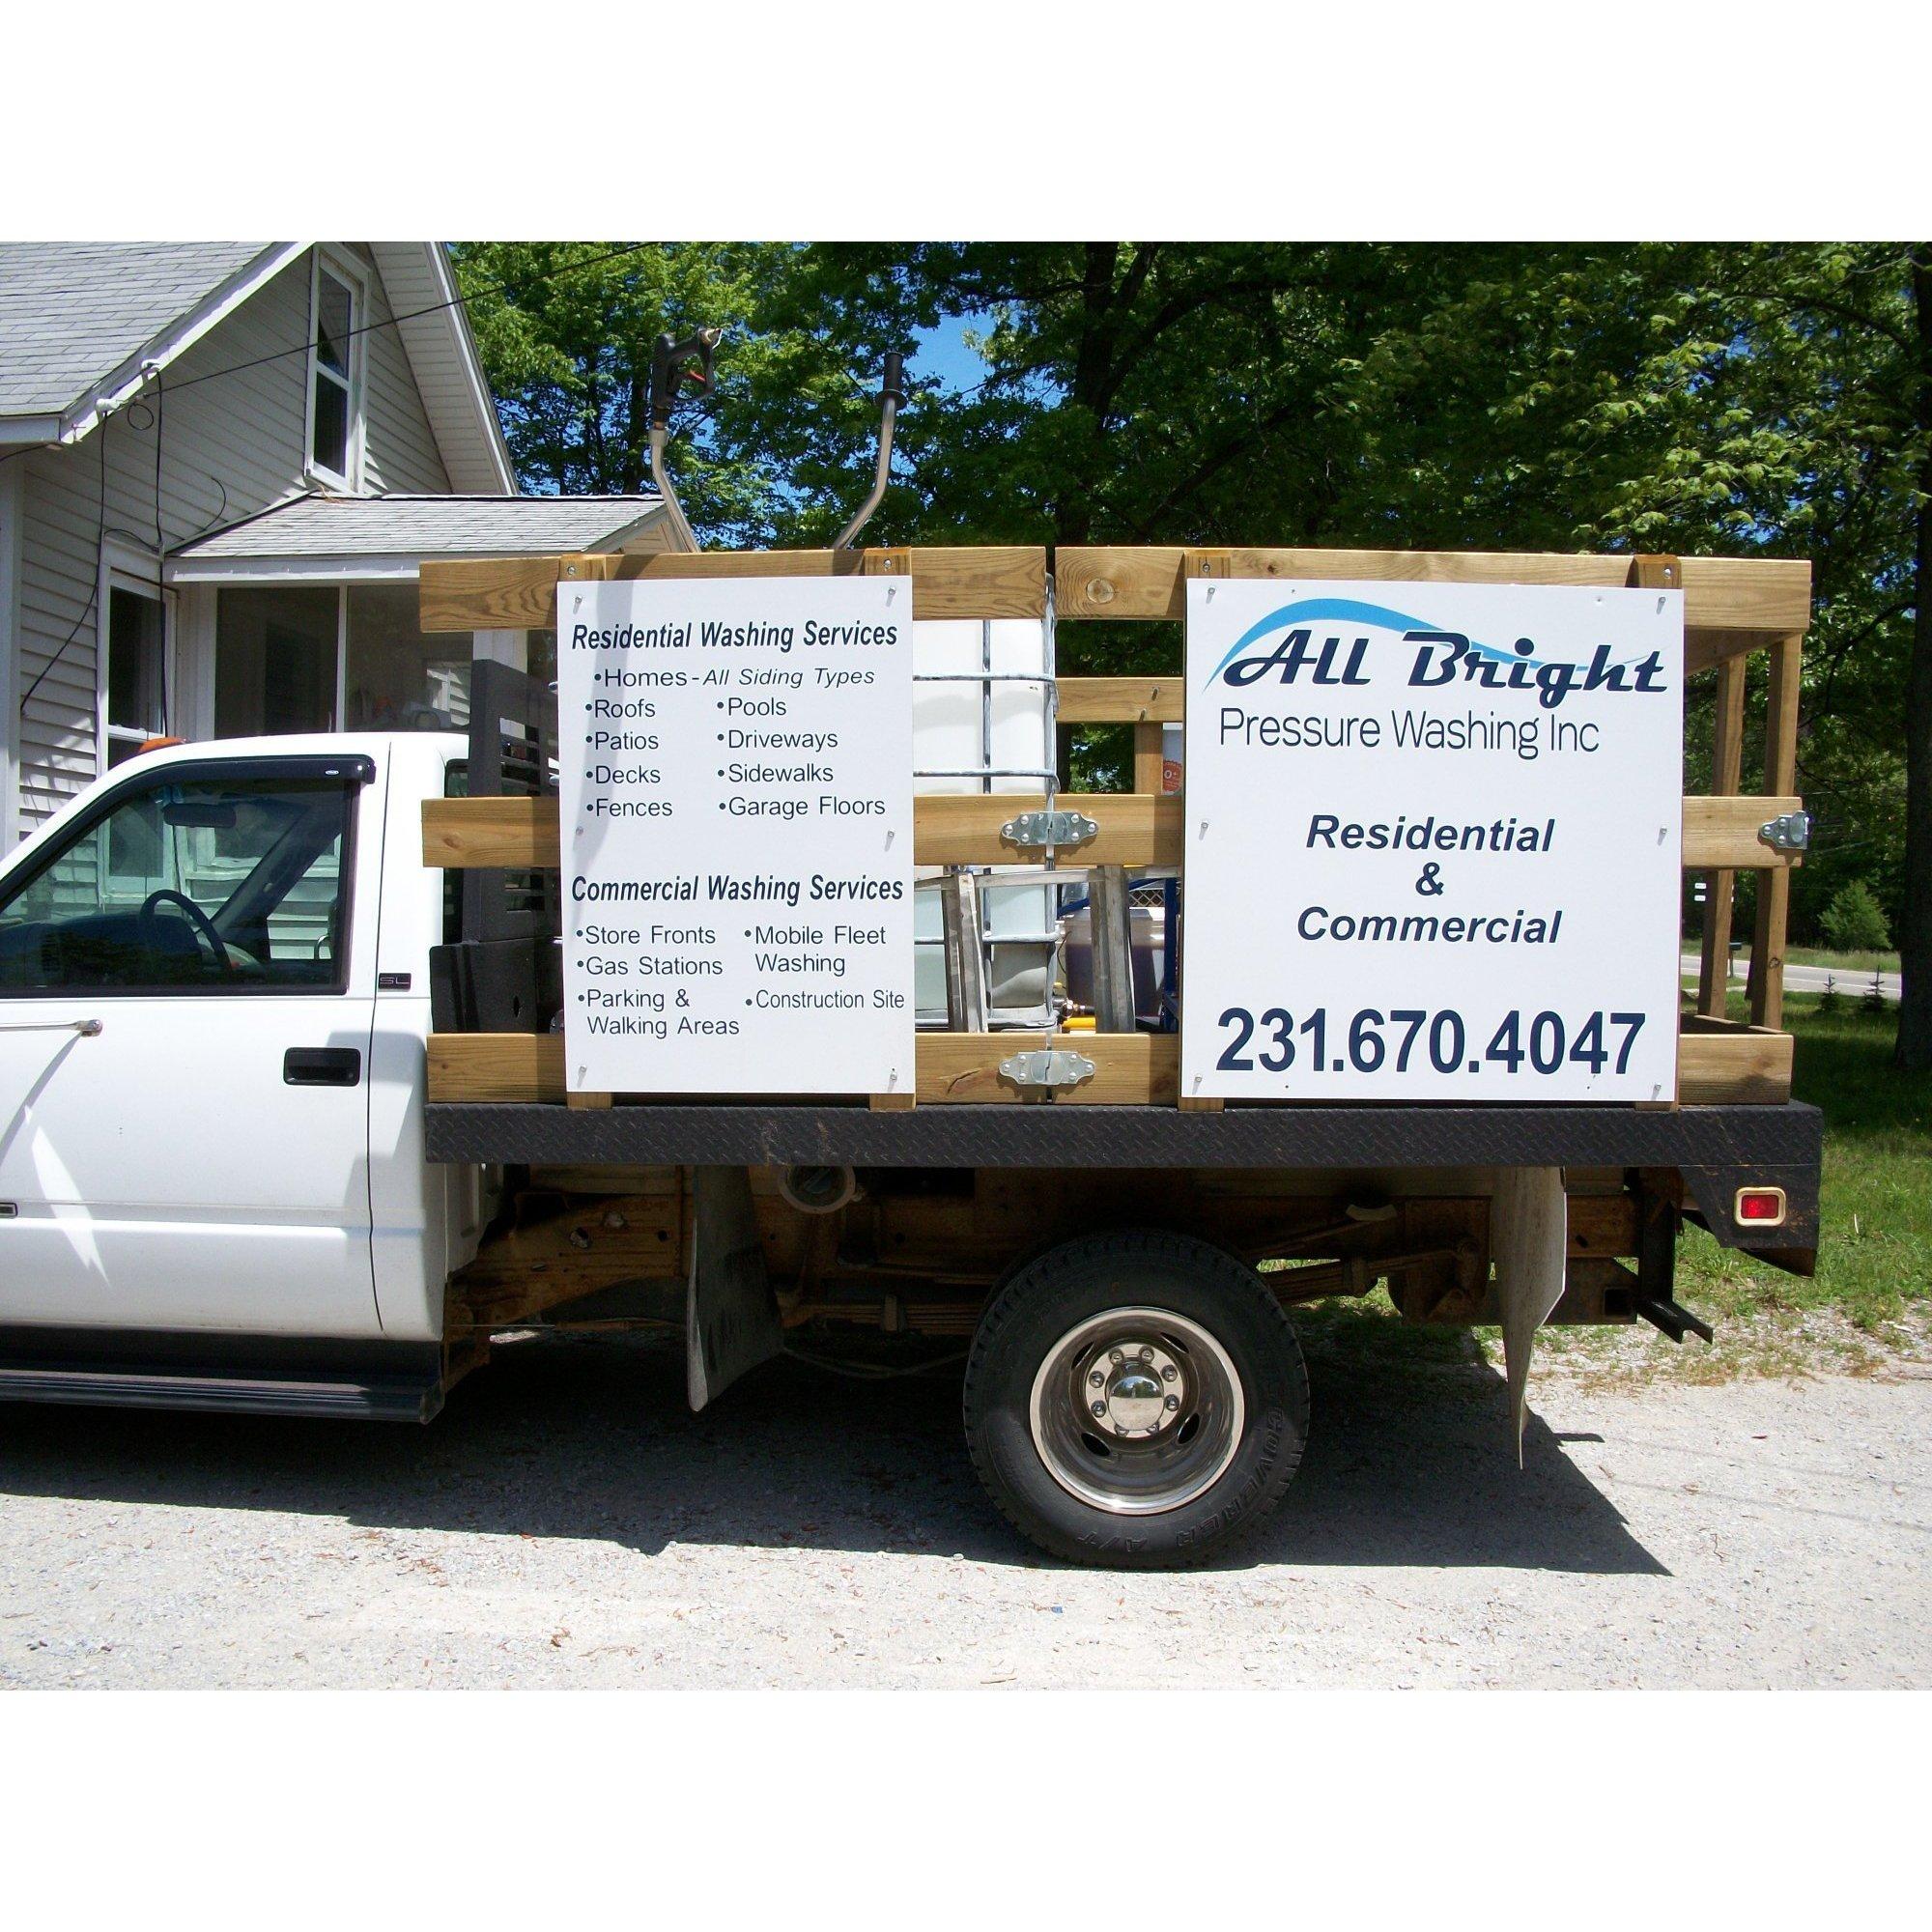 All Bright Pressure Washing Inc. image 5